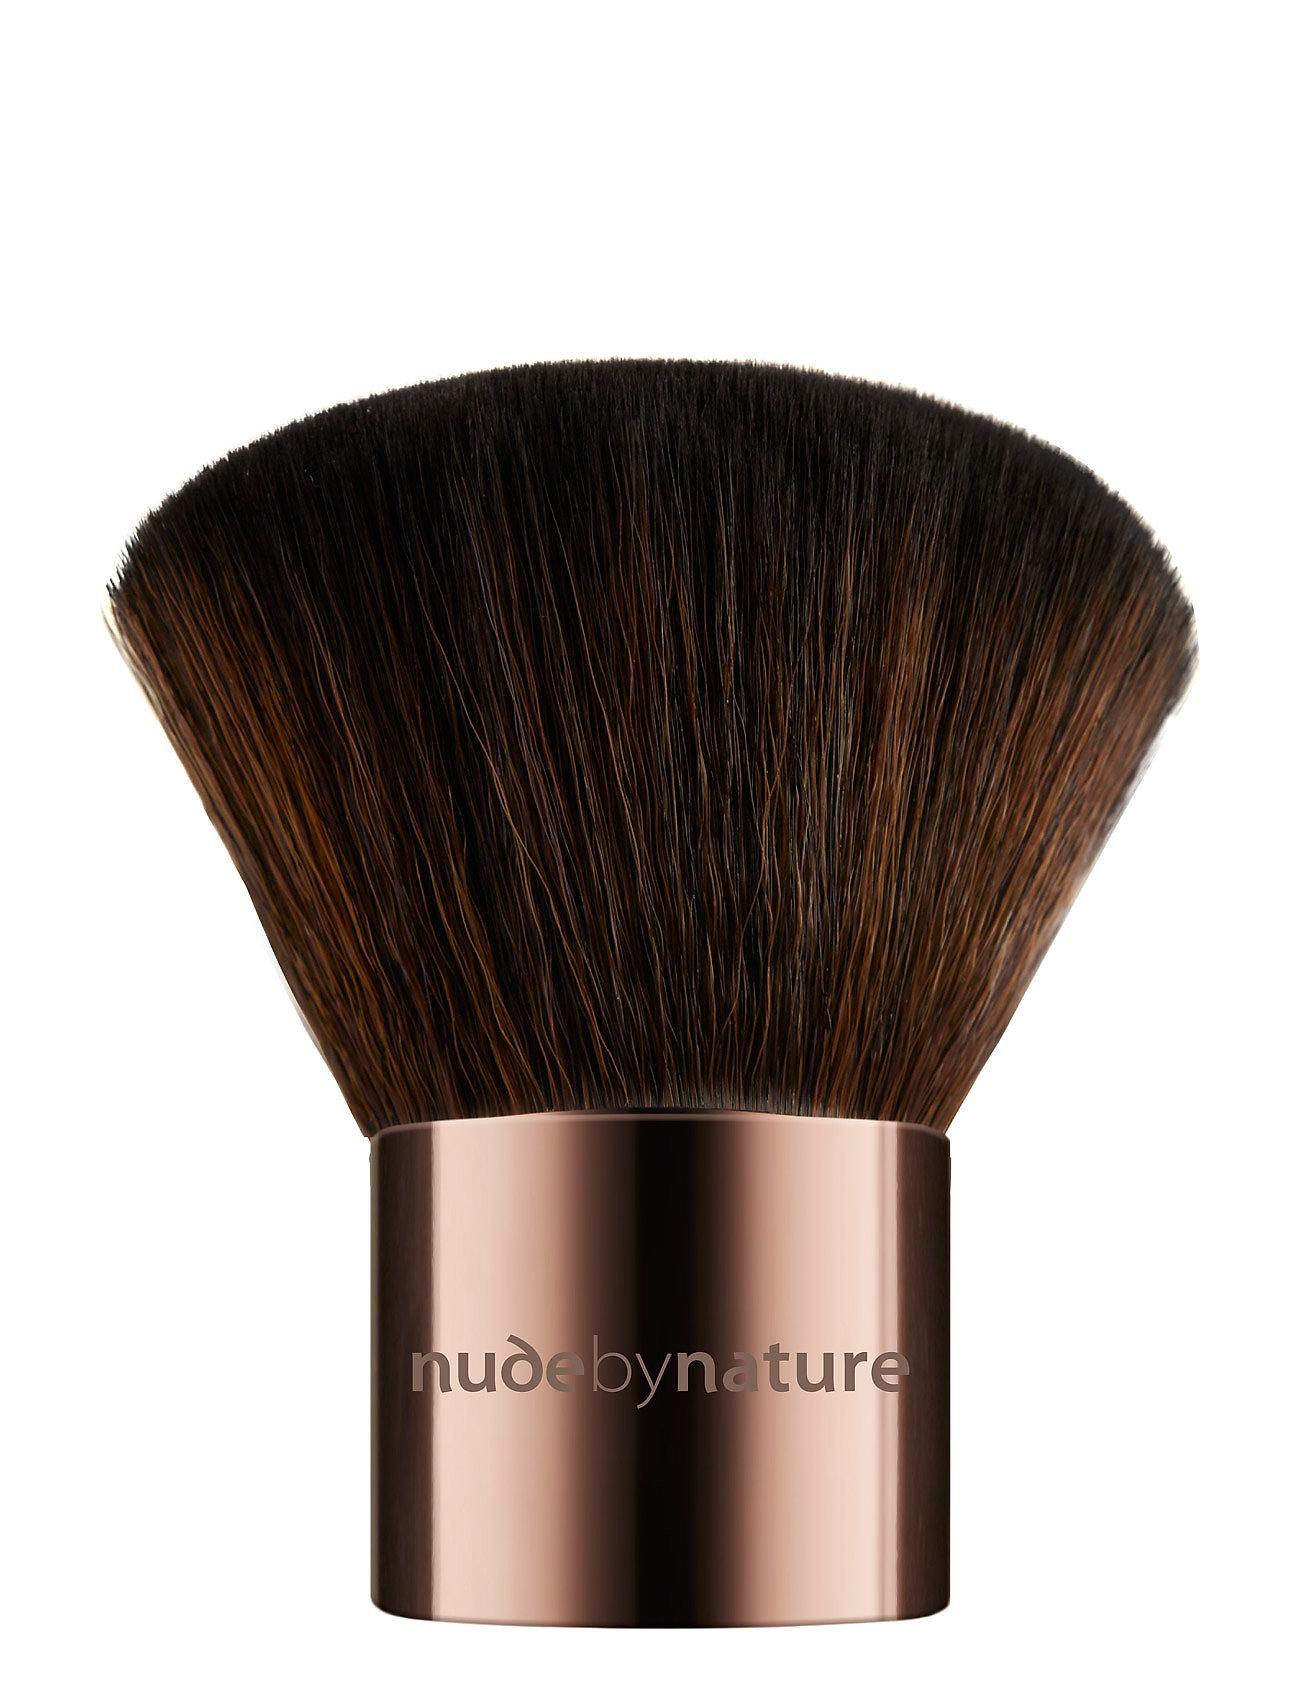 Image of Brushes 07 Kabuki Brush Ansigtsbørste Makeup Nude Nude By Nature (2778815171)